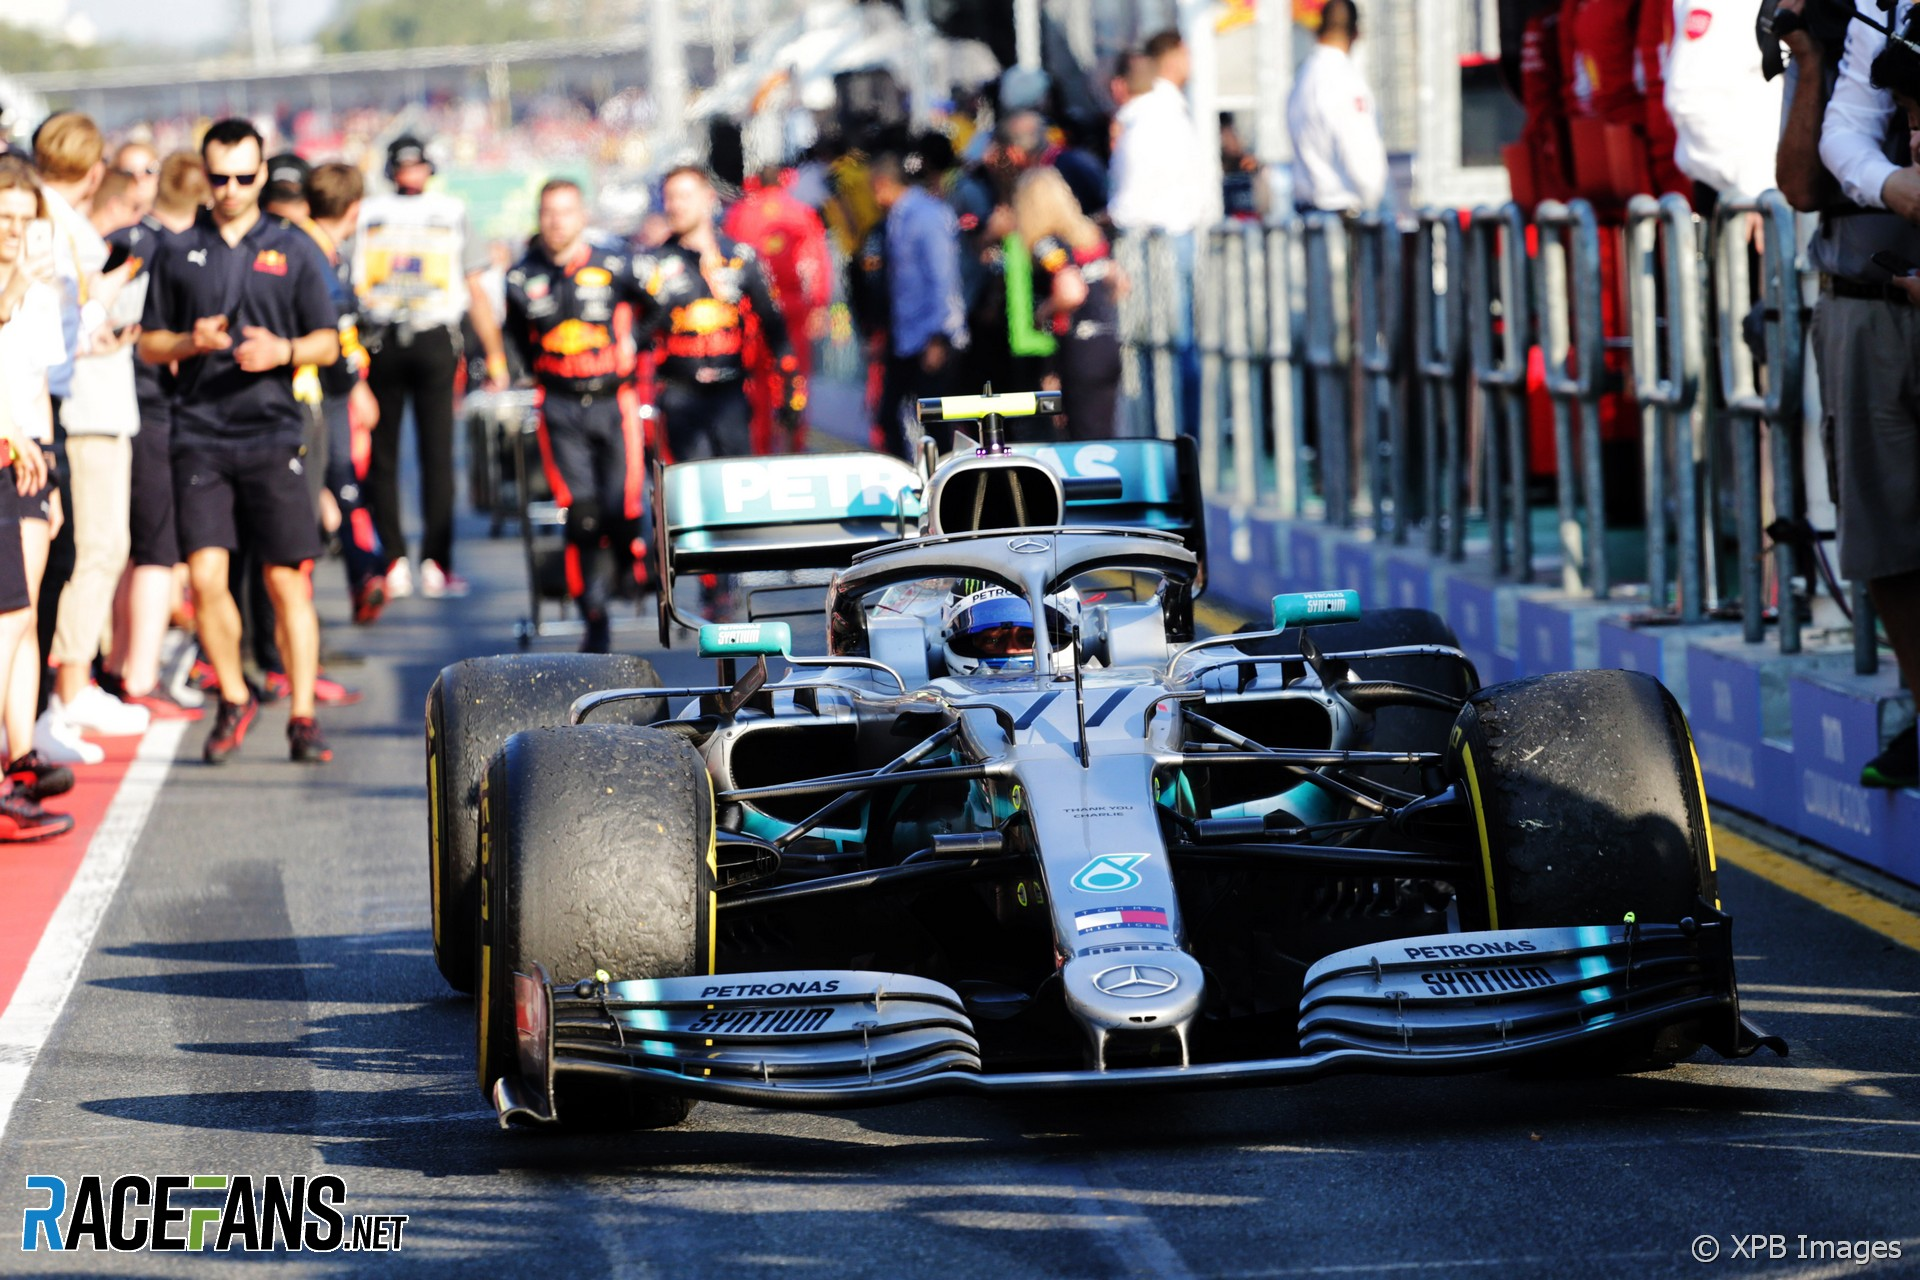 Valtteri Bottas, Mercedes, Albert Park, 2019